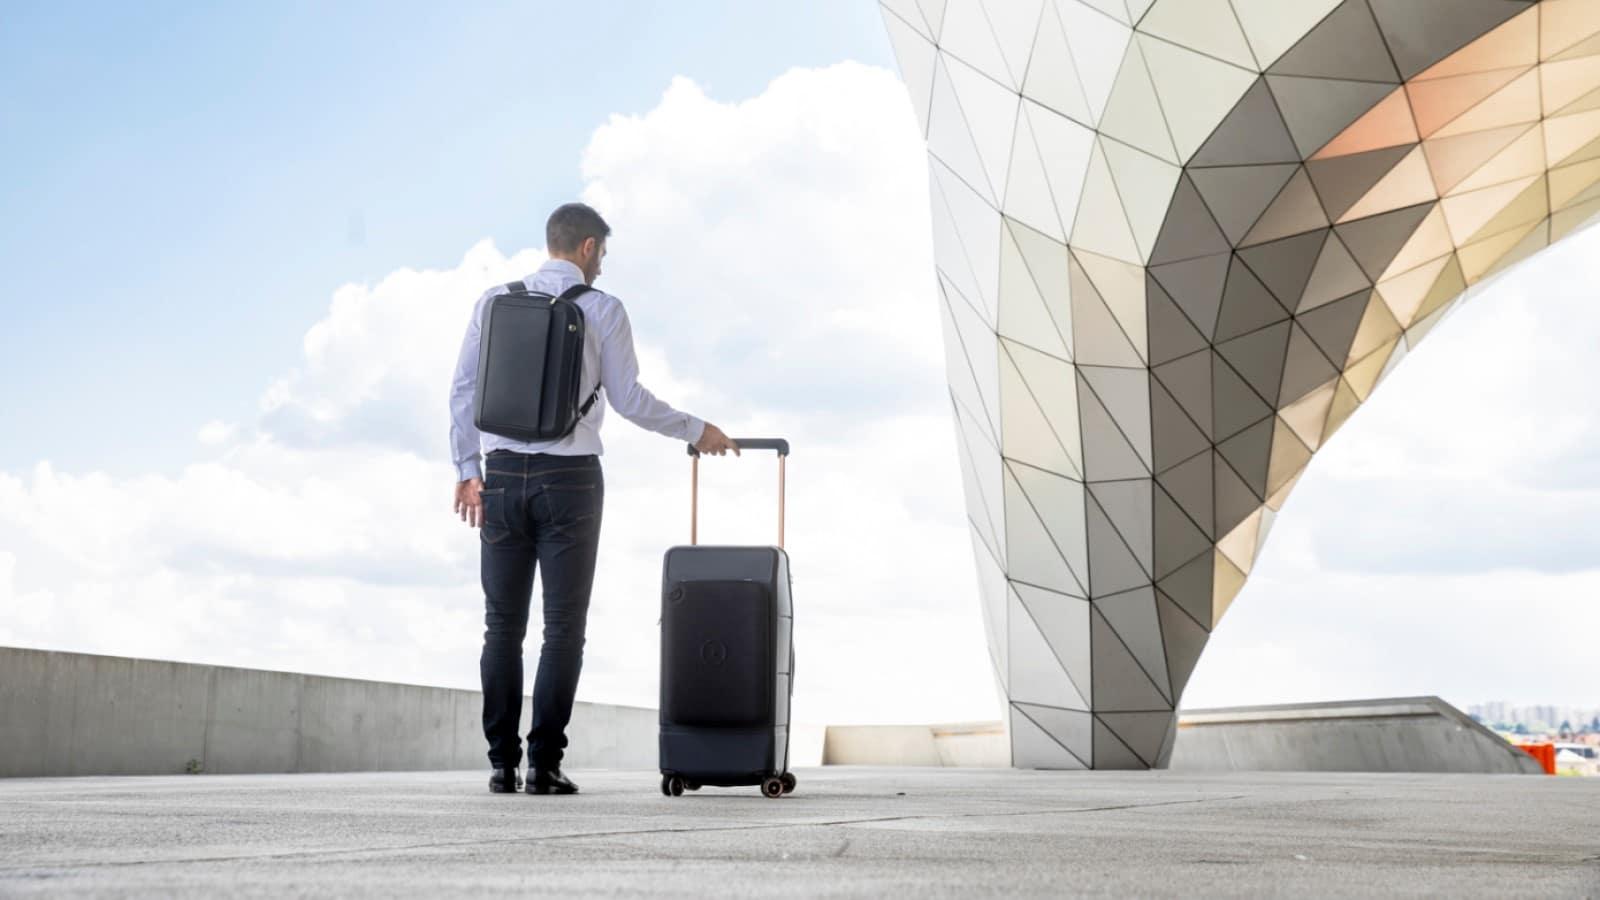 kabuto smart suitcase next to a man